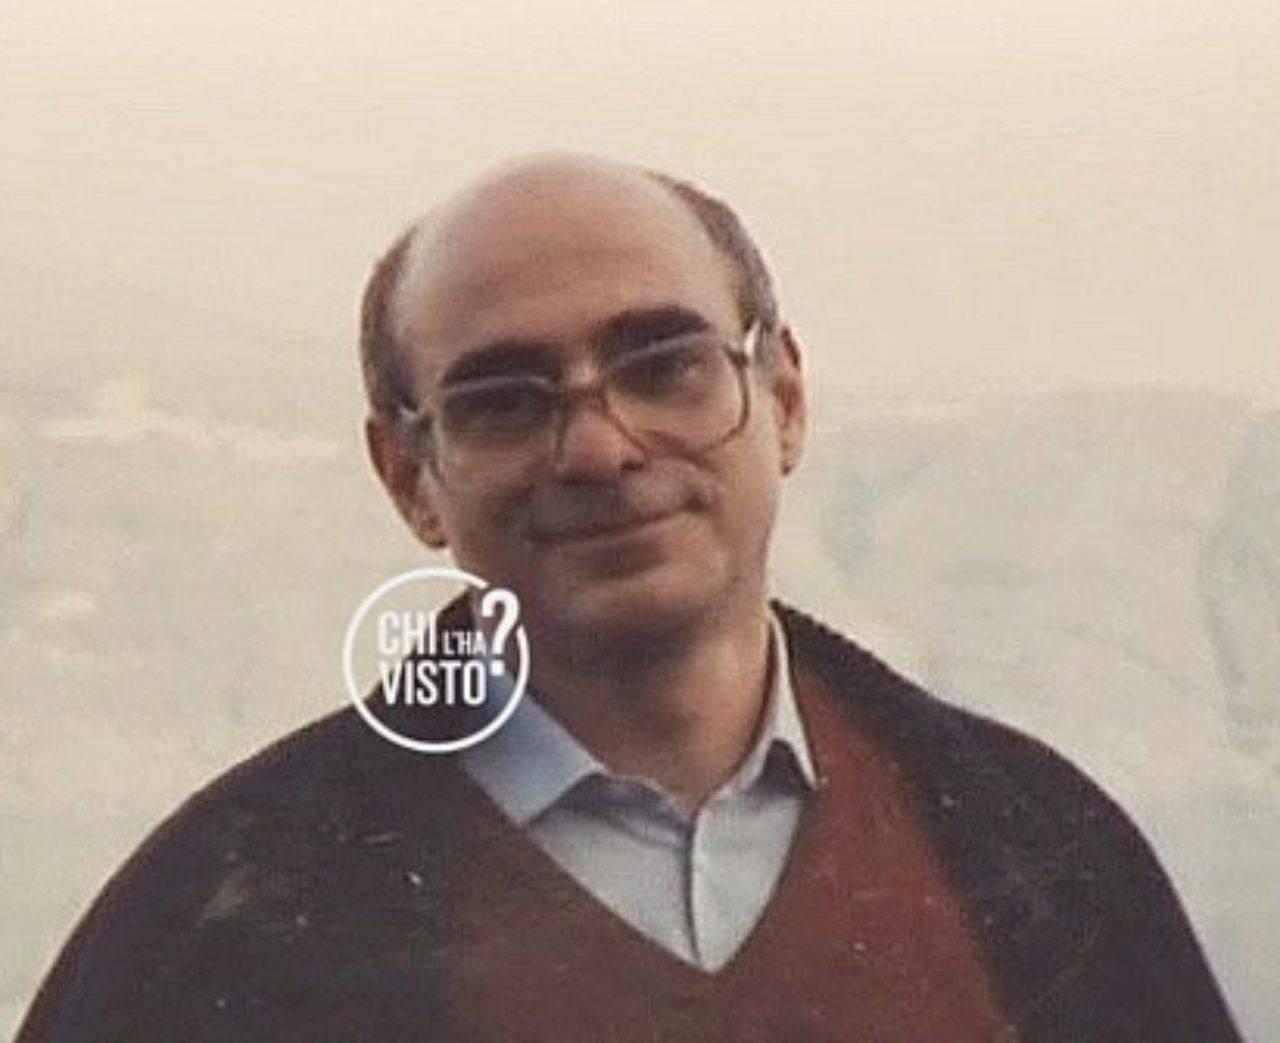 Paolo Adinolfi